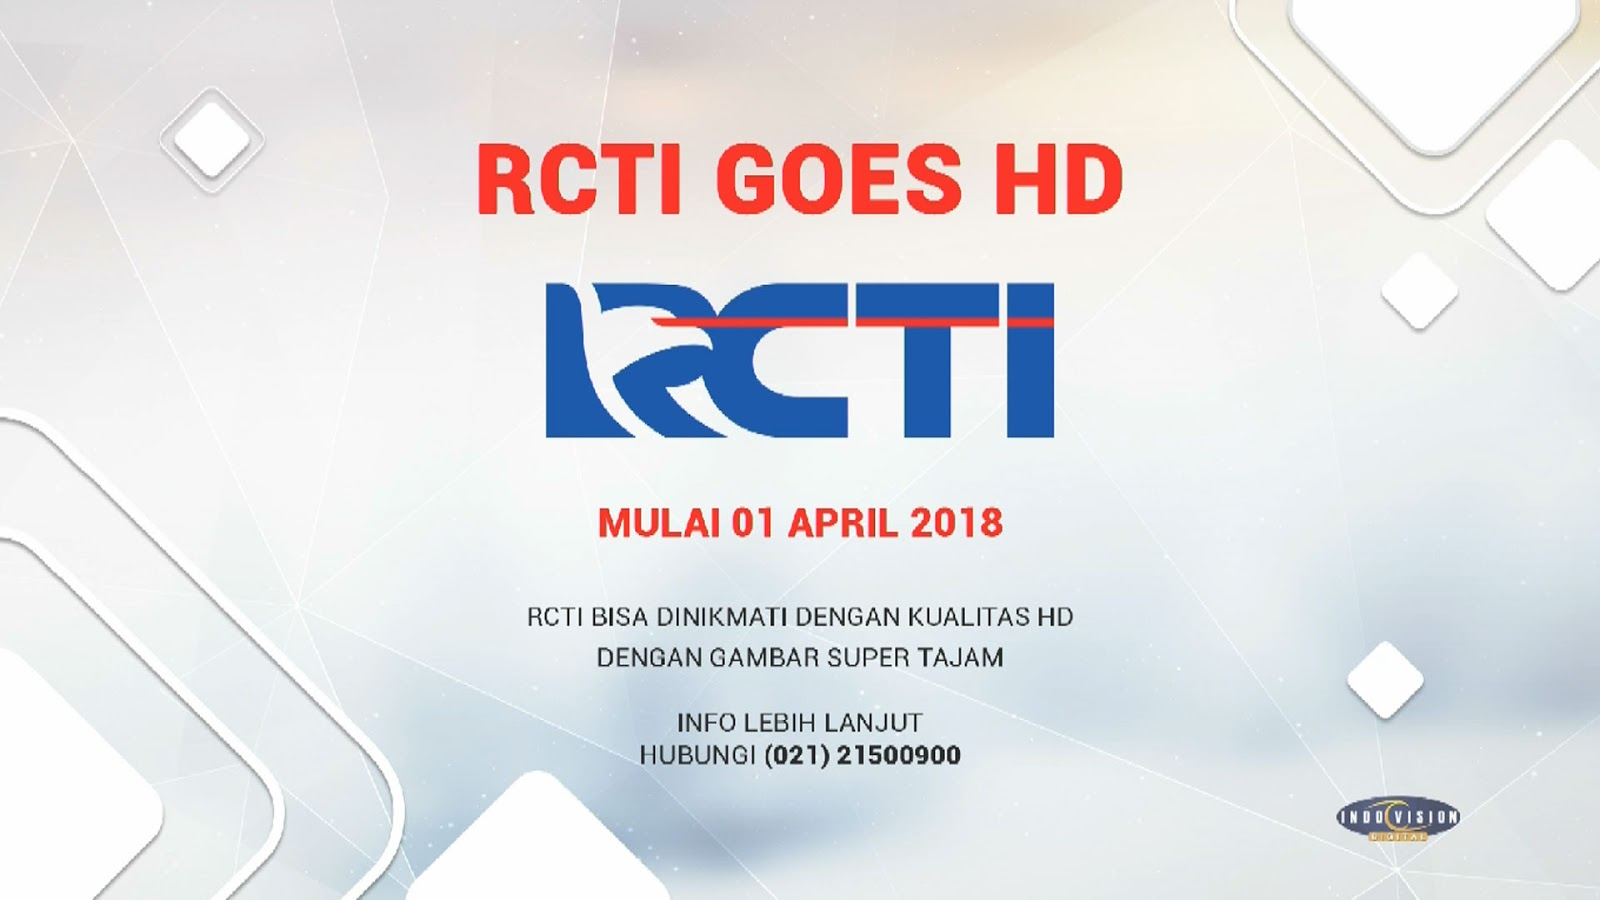 Nonton RCTI HD di Parabola Indovision MNC Vision